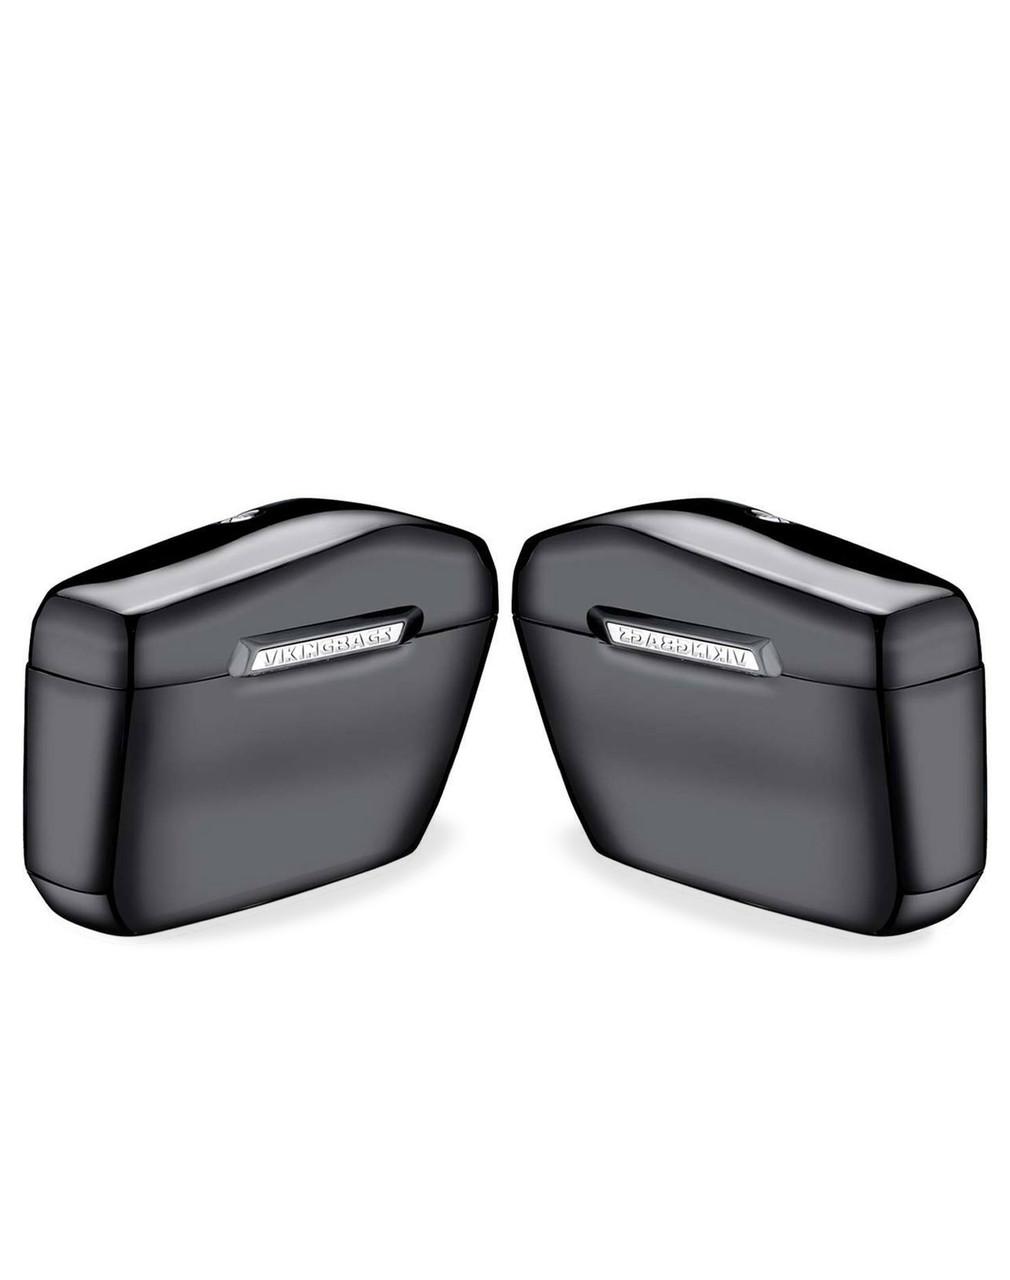 Honda VTX 1800 F Viking Lamellar Large Black Hard Saddlebags Both Bags view